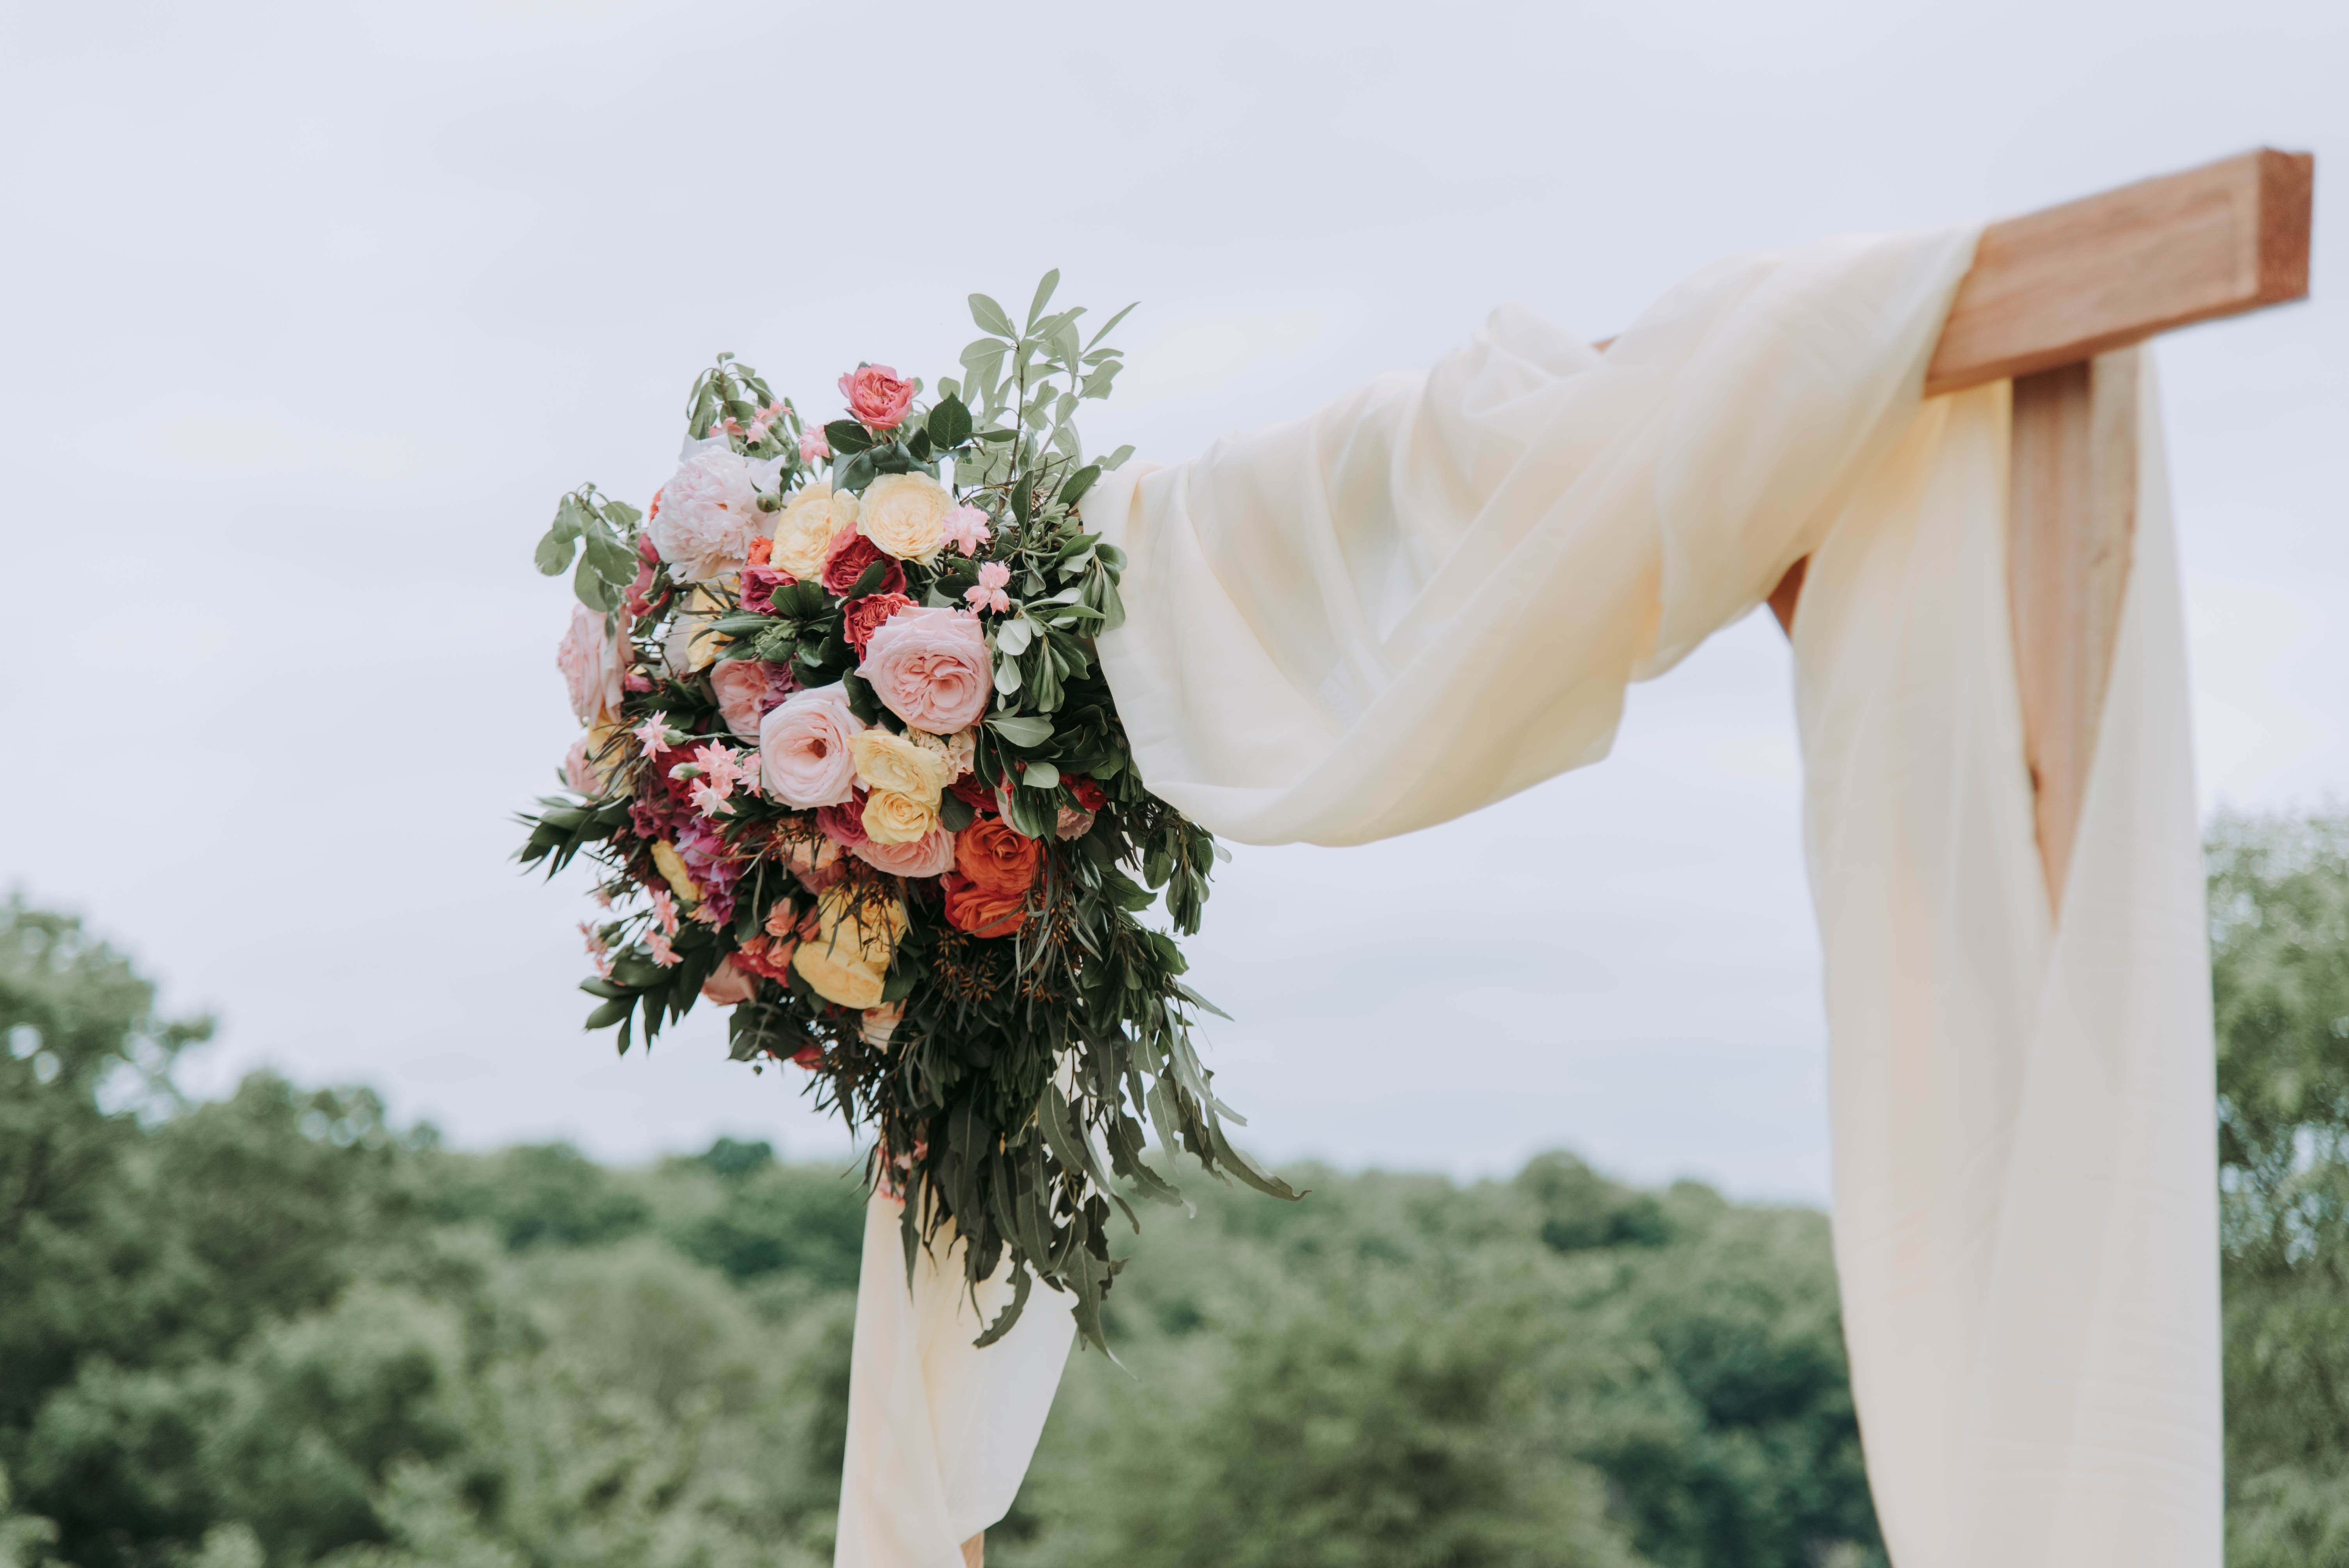 ceremonie laique reception organisation décoration mariage plan my day wedding planner haut doubs morteau pontarlier besancon